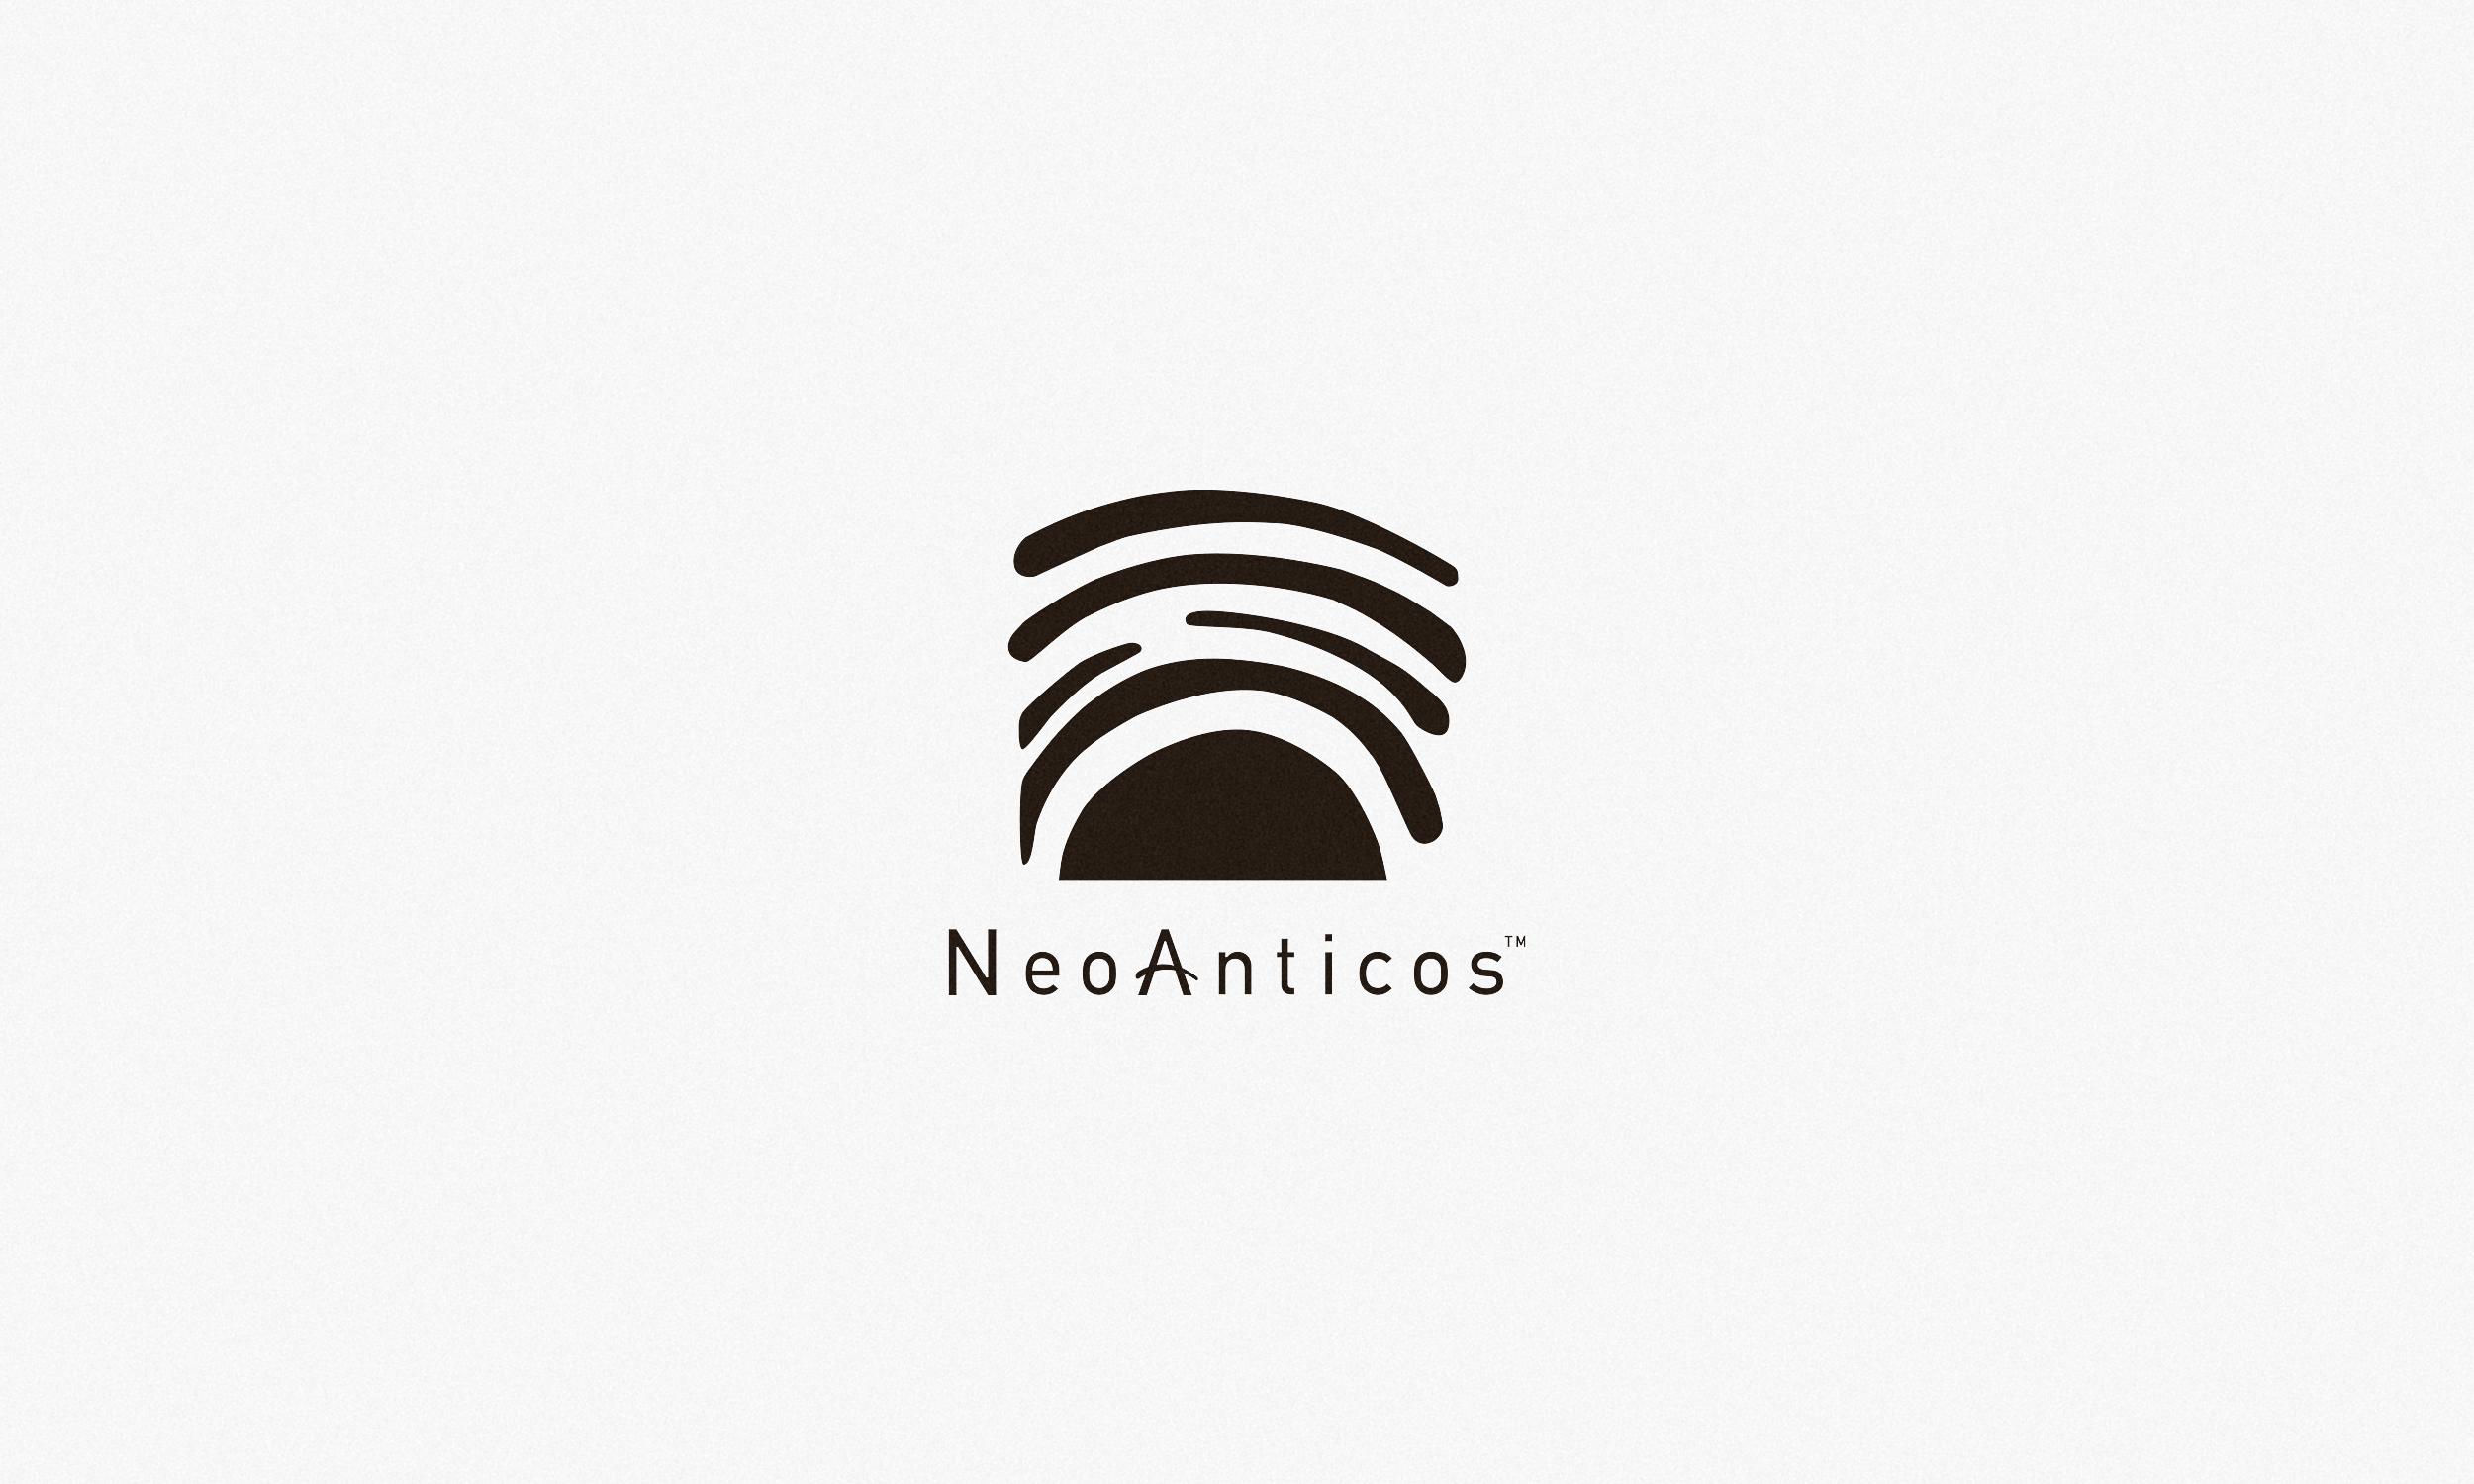 NeoAnticos™